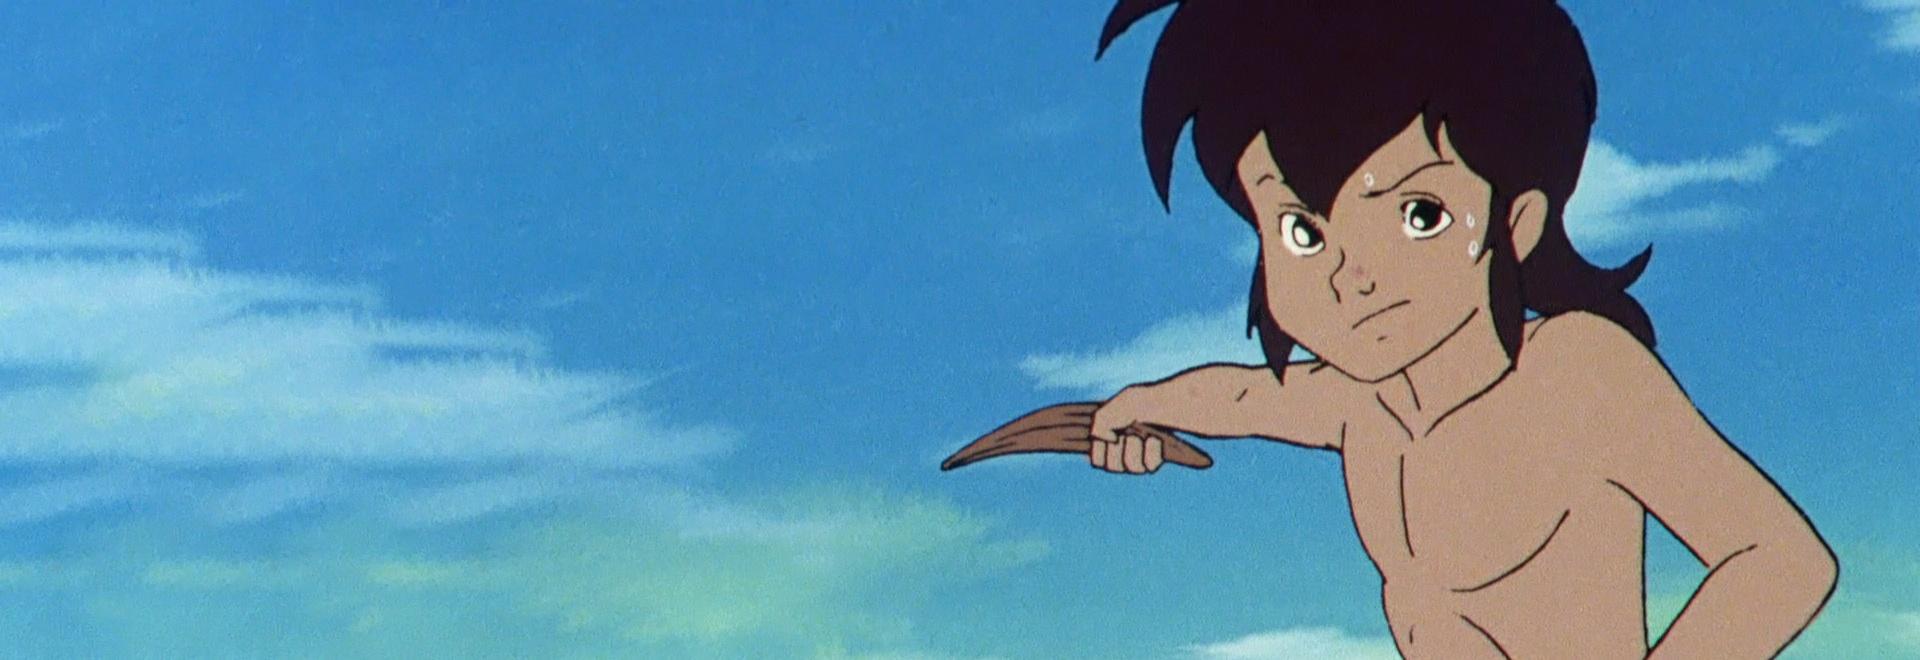 Mowgli va al villaggio